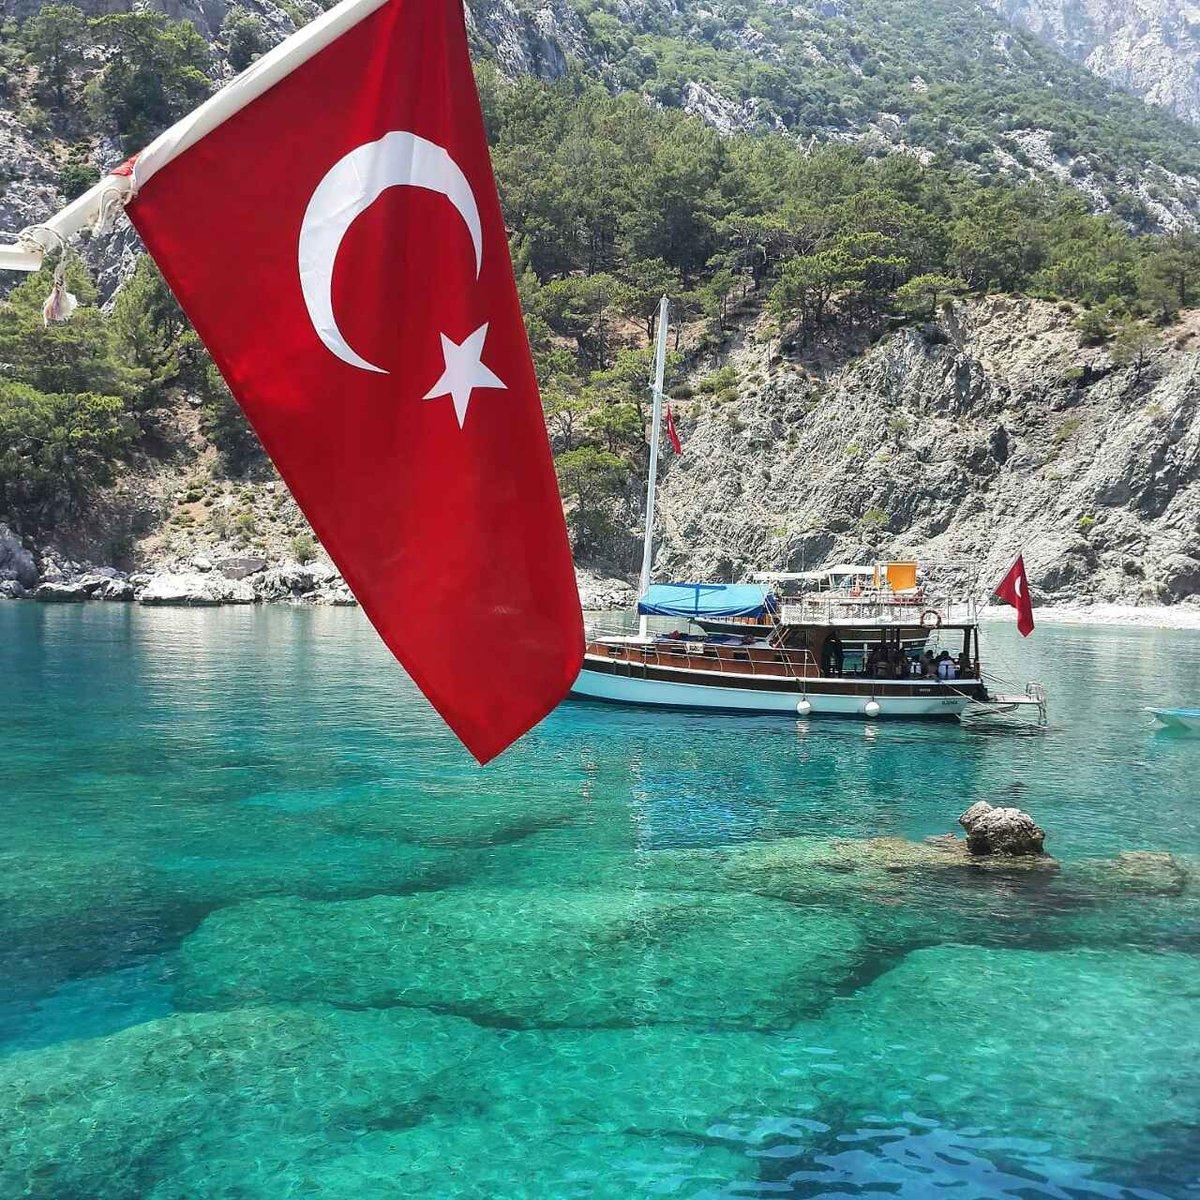 Vacation in Turkey during the velvet season